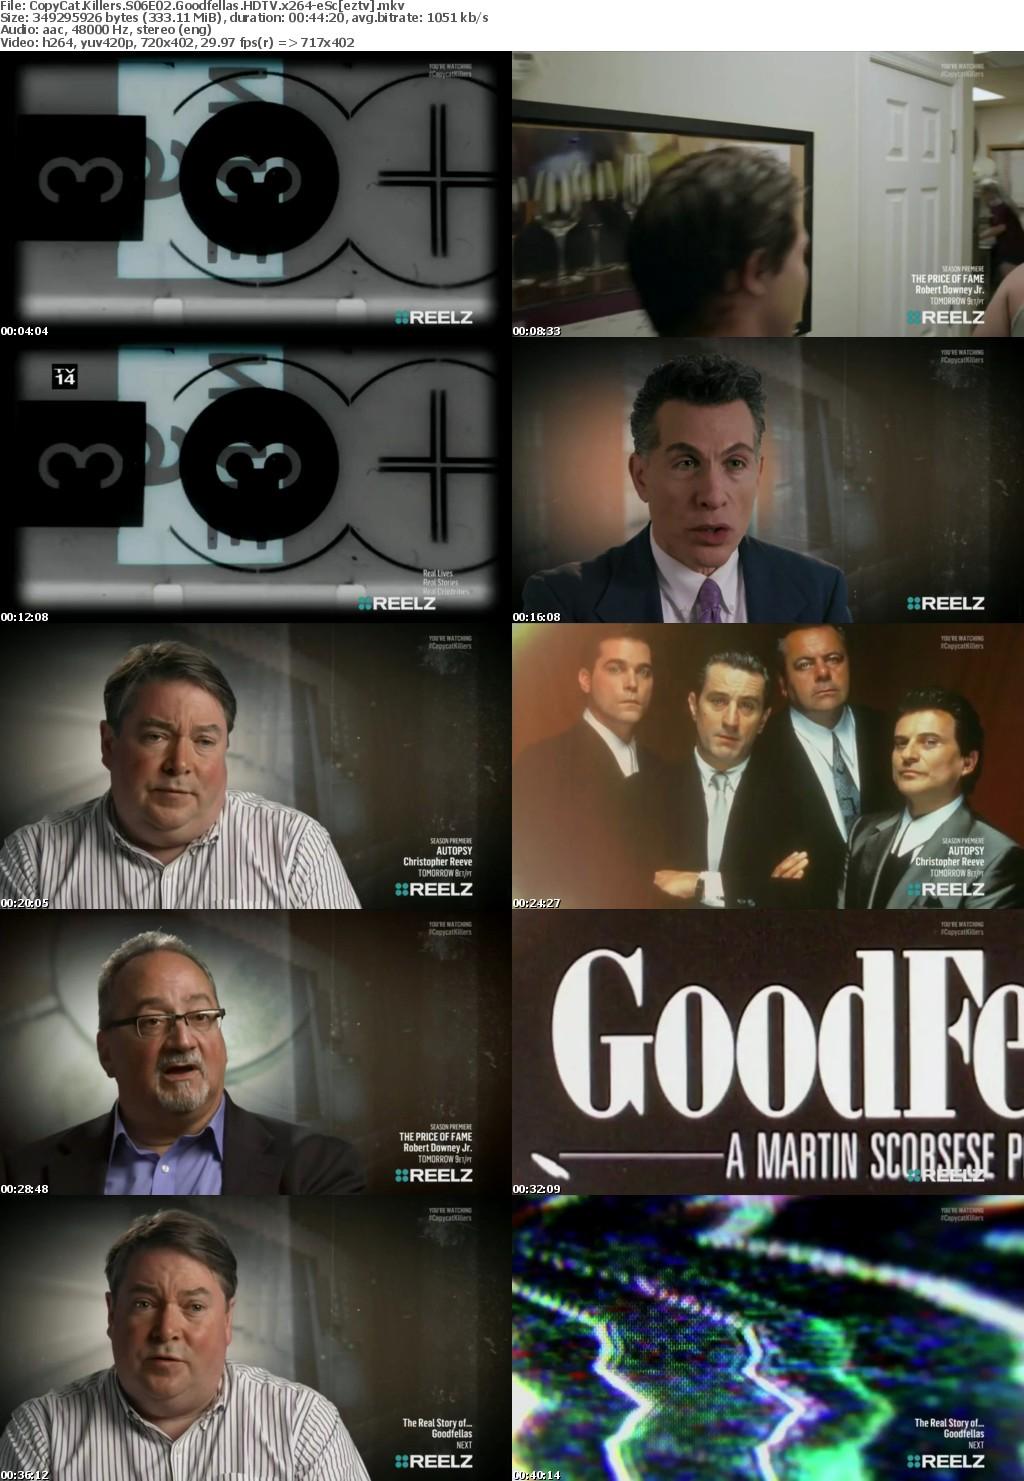 CopyCat Killers S06E02 Goodfellas HDTV x264-eSc